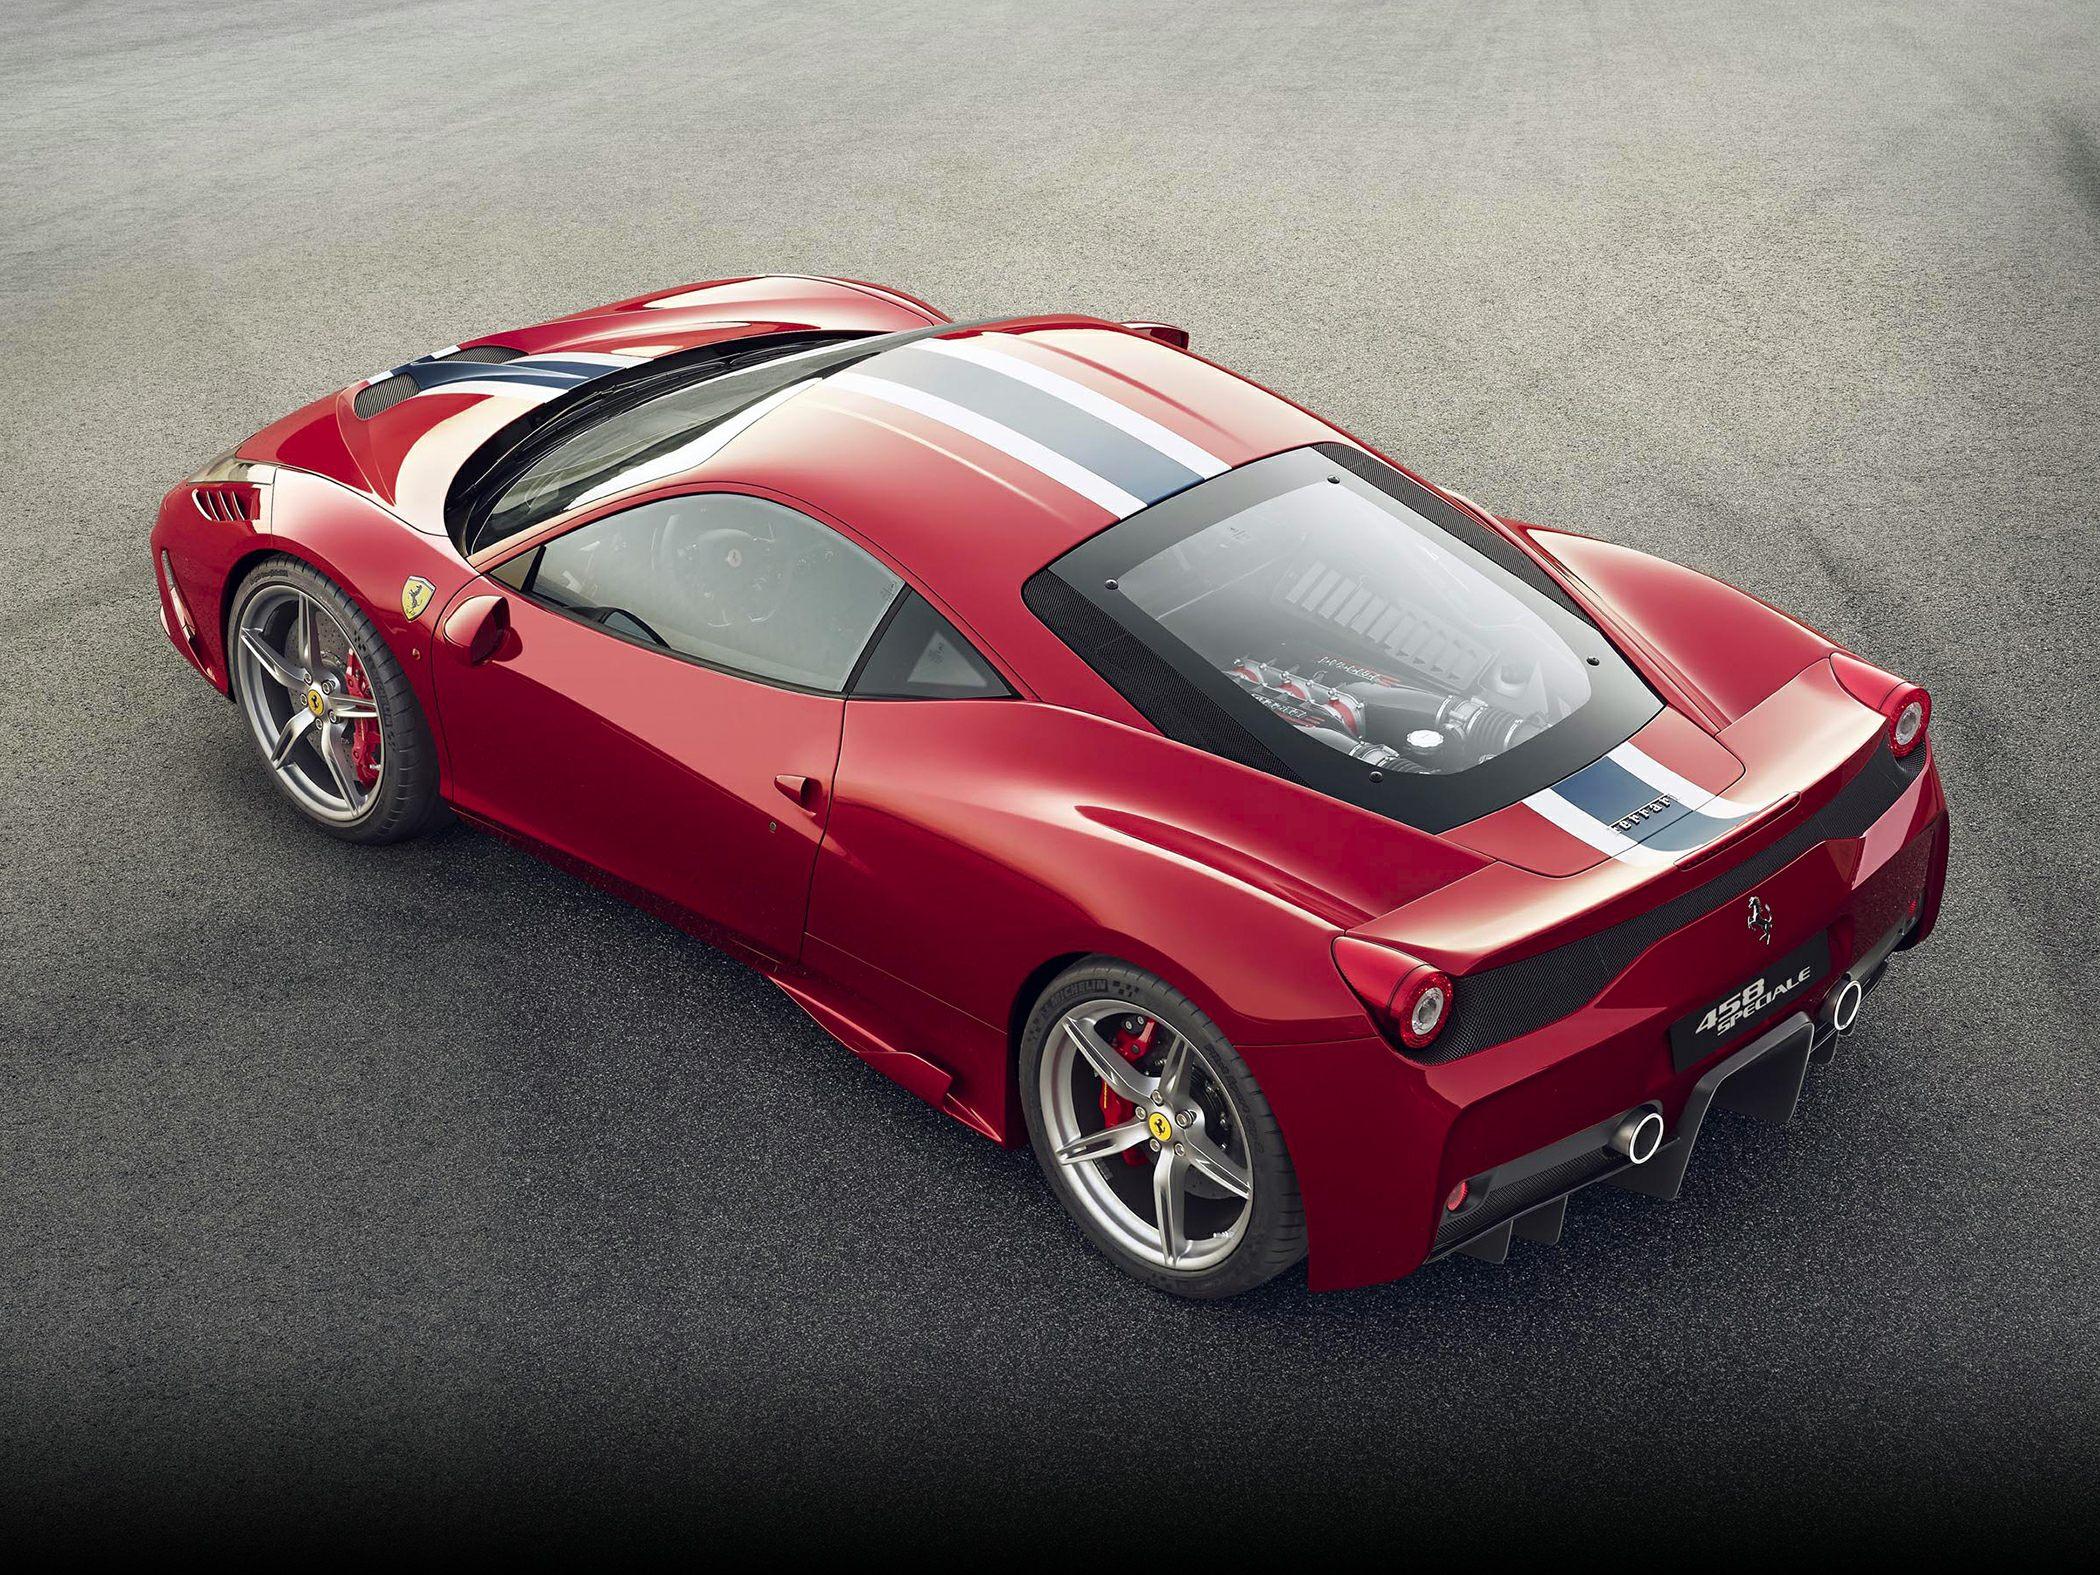 Ferrari 458 Speciale Price >> 2014 Ferrari 458 Speciale Base 2dr Coupe Pictures